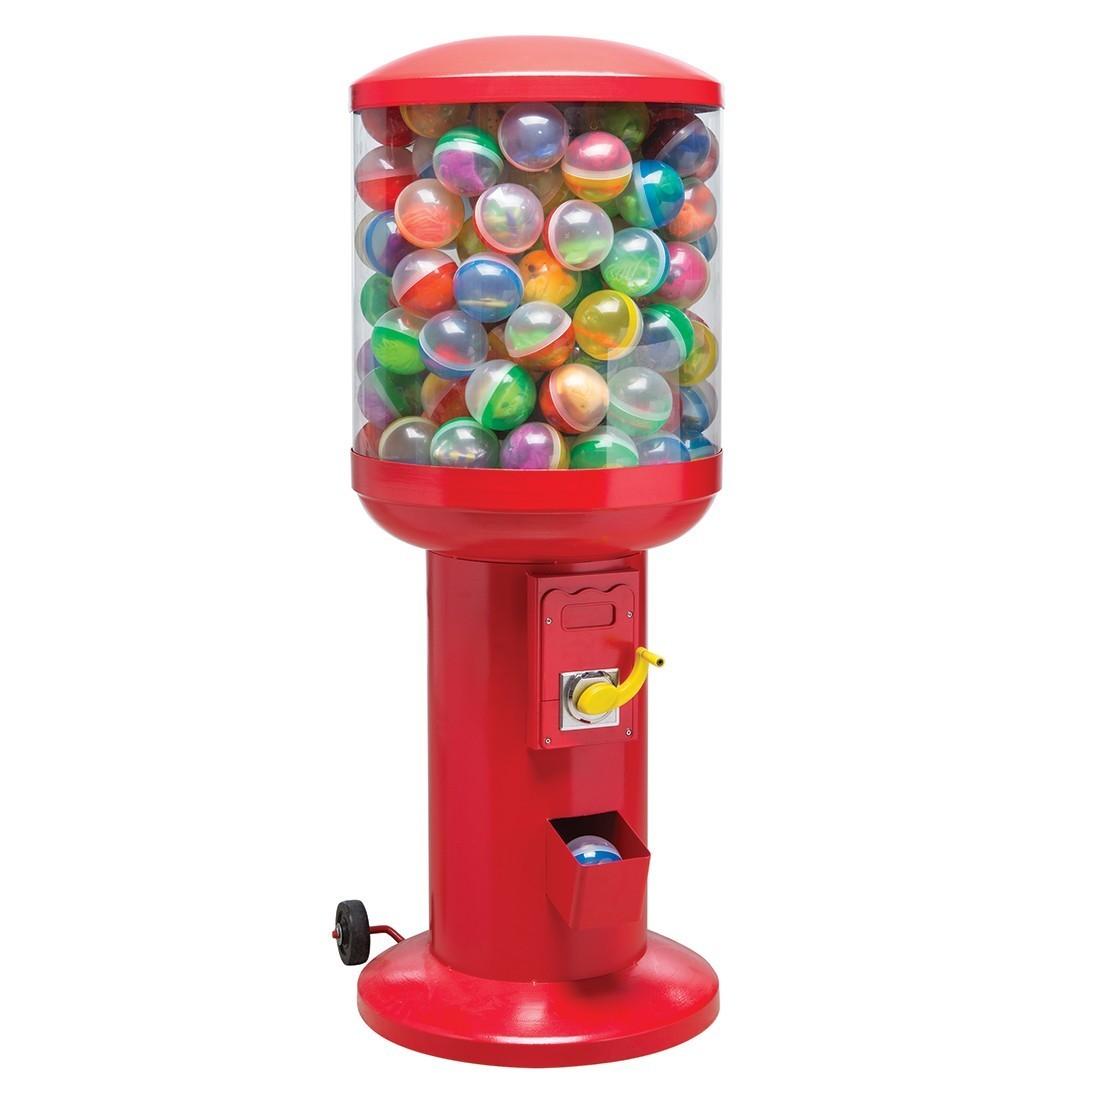 "SmileMakers 4"" Capsule Vending Machine [image]"